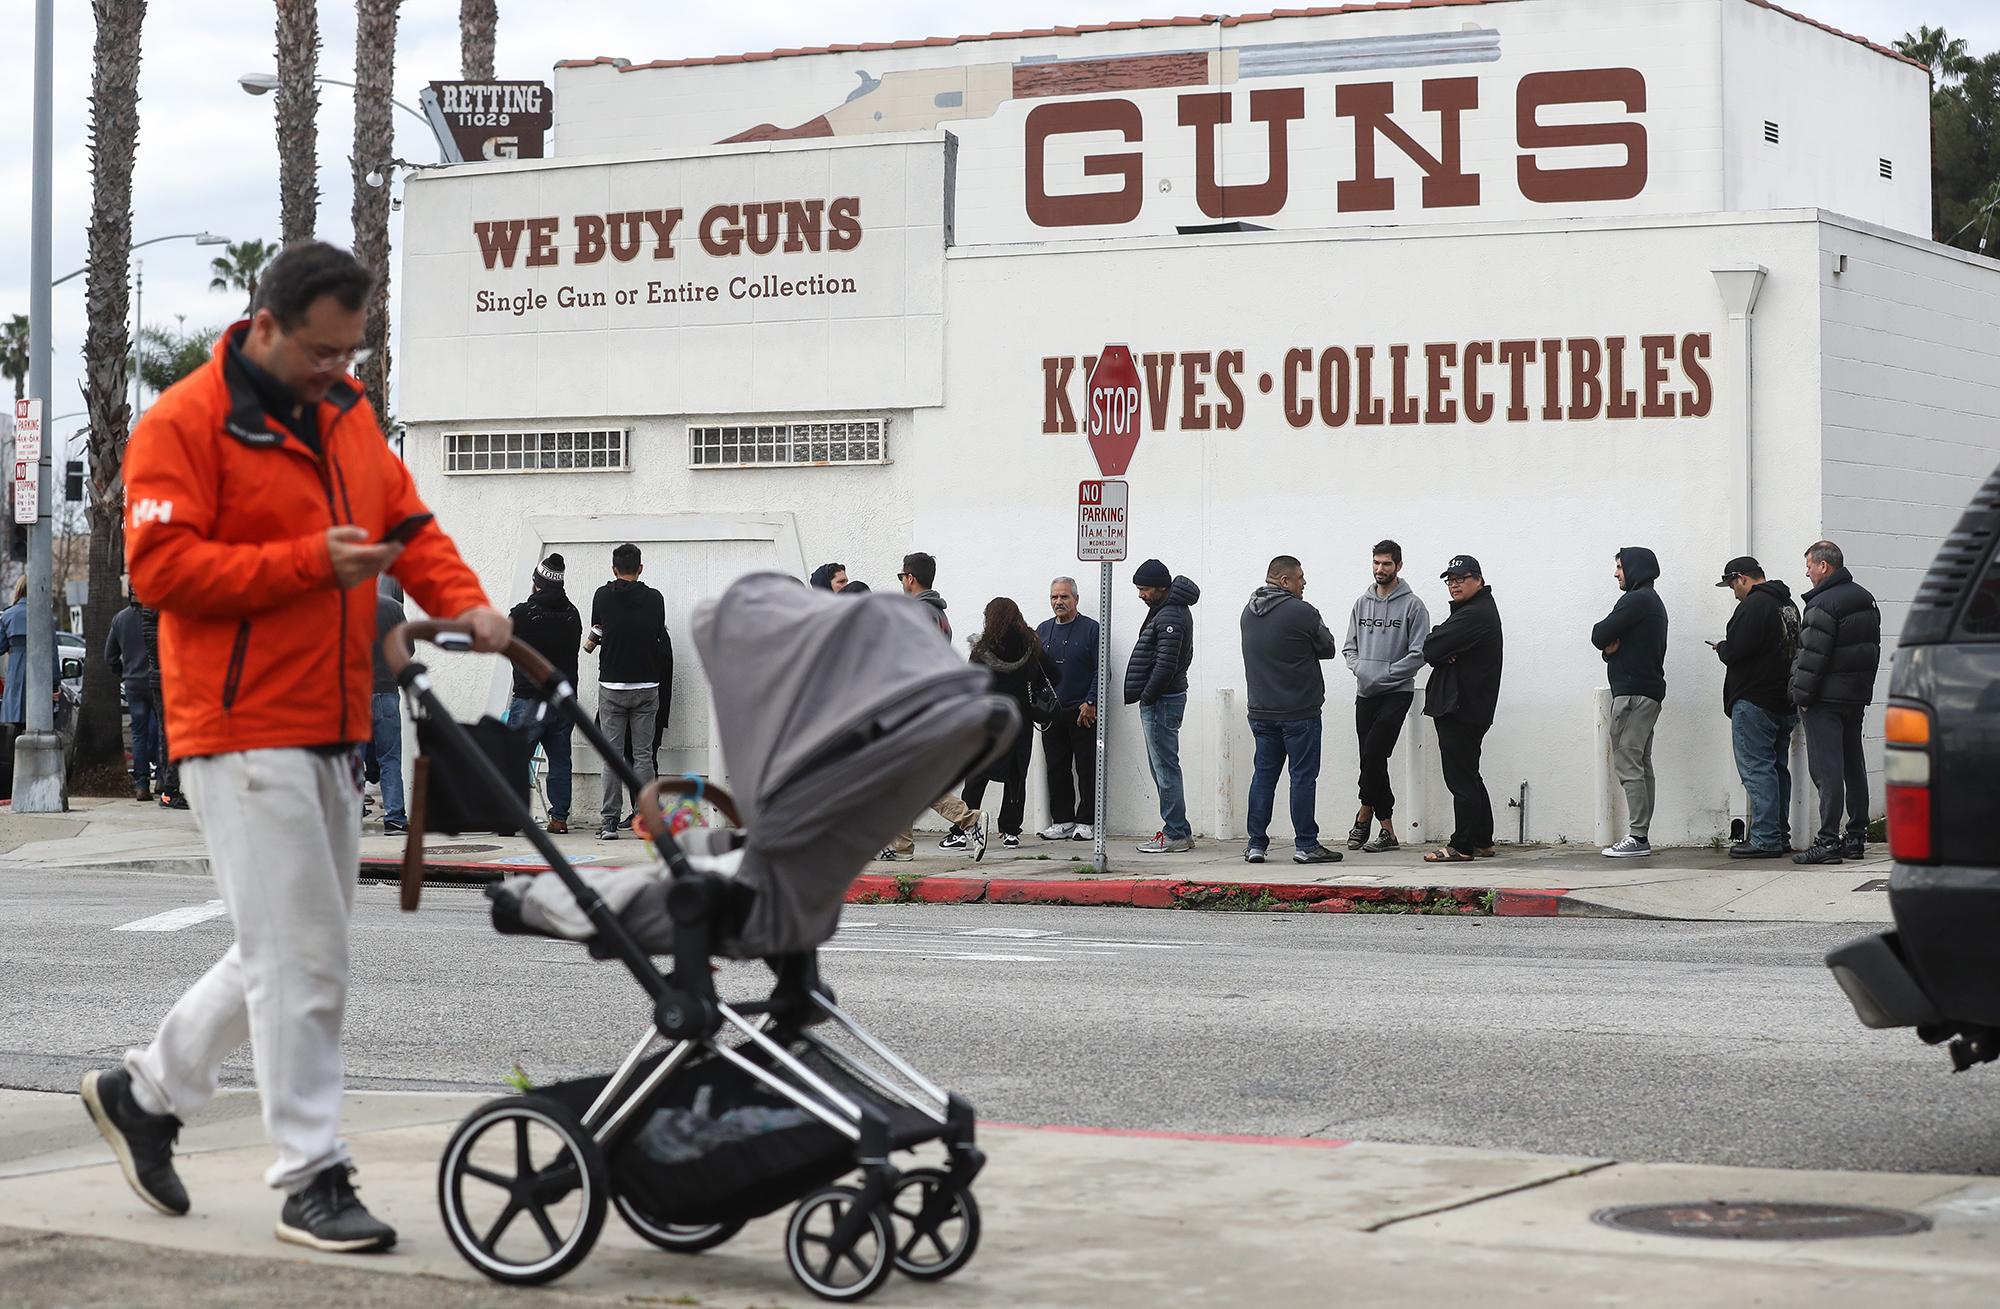 FBI sees spike in gun sale background checks amid coronavirus pandemic